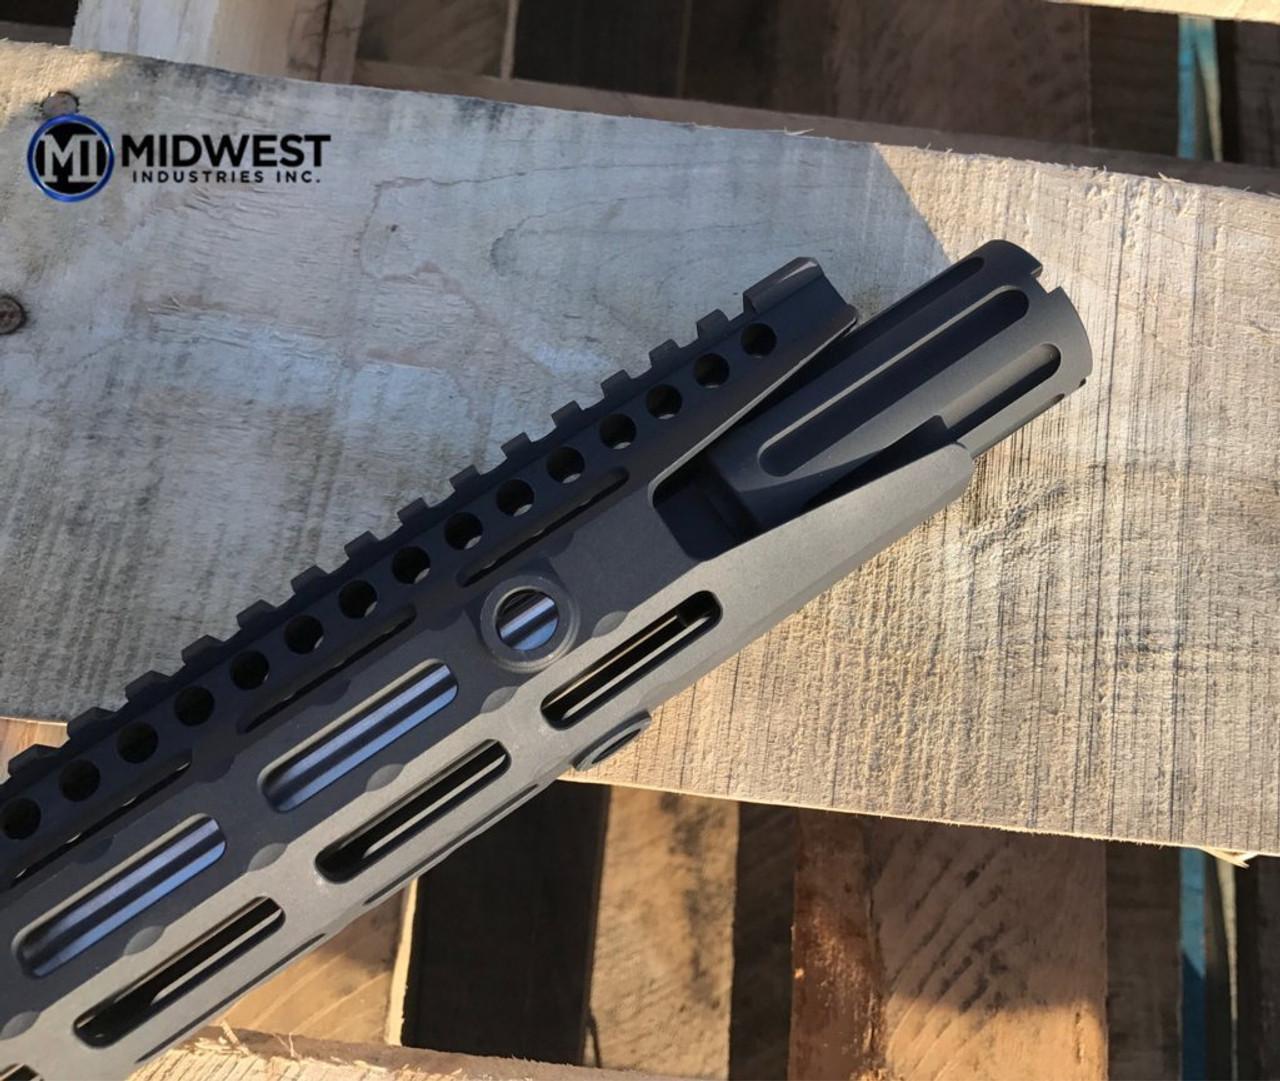 Midwest Industries Blast Can AR-15 Muzzle Device 5.56mm NATO Threaded 1/2x28 6061 Aluminum Hard Coat Anodized Matte Black (CT35MWMI-BC556)